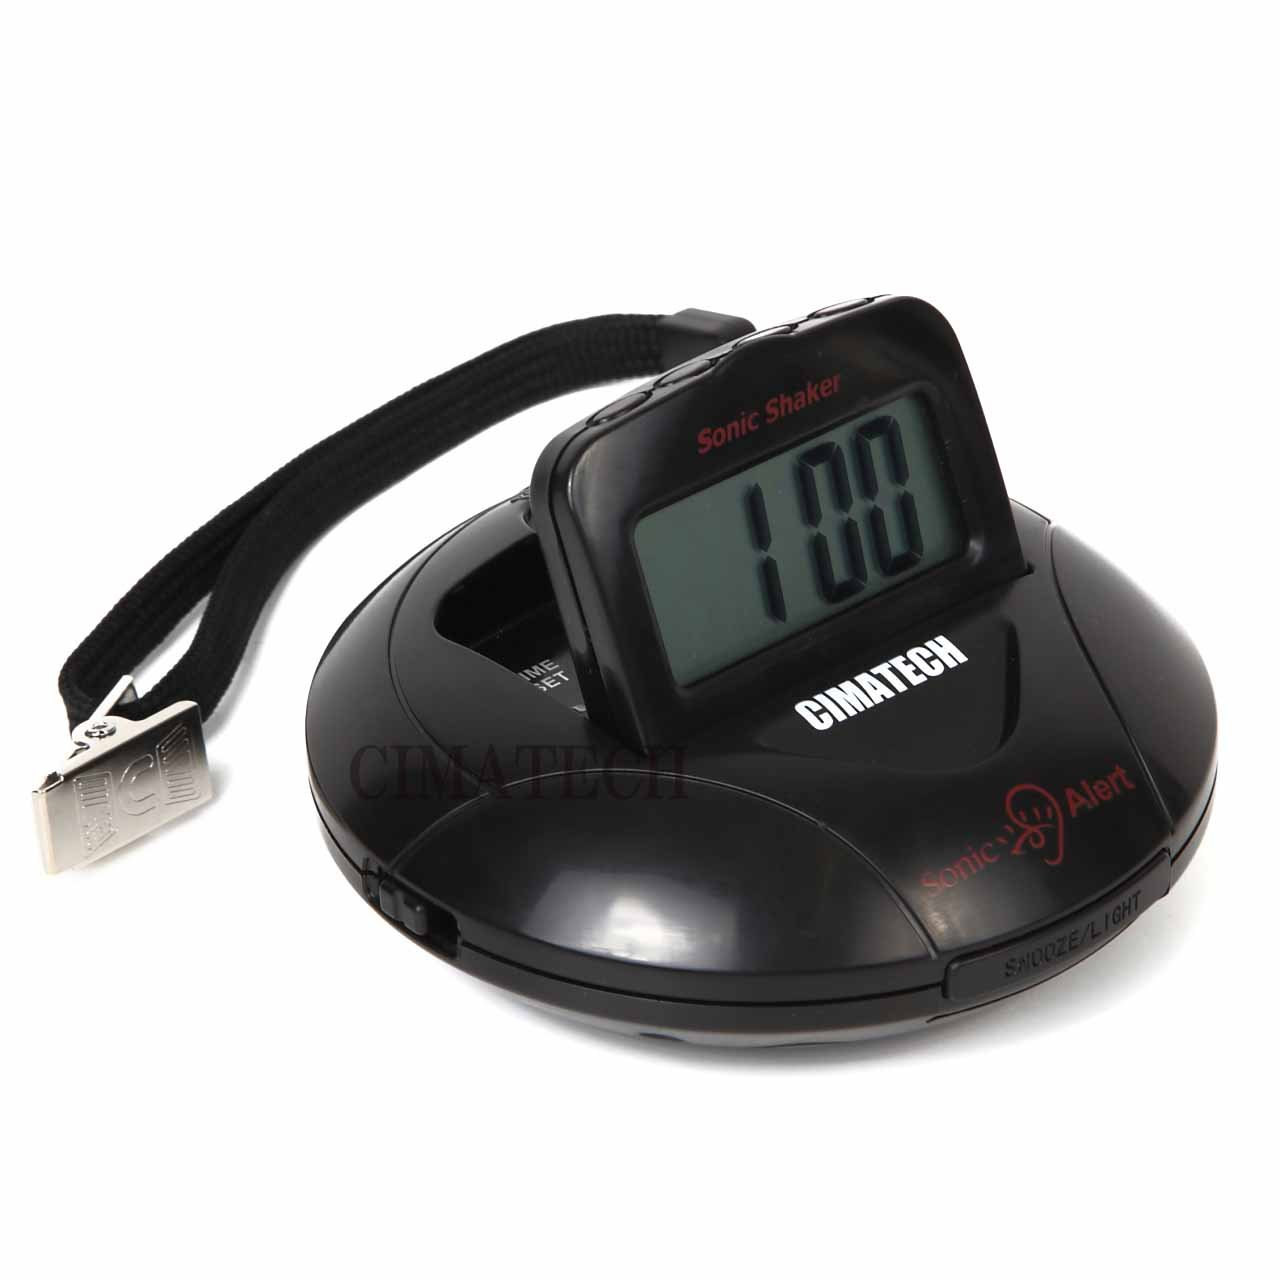 CIMATECH 強力 振動式 目覚まし時計 携帯型 ポータブル ソニックシェーカー (Black 黒) B0739QN7S5 Black 黒 Black 黒